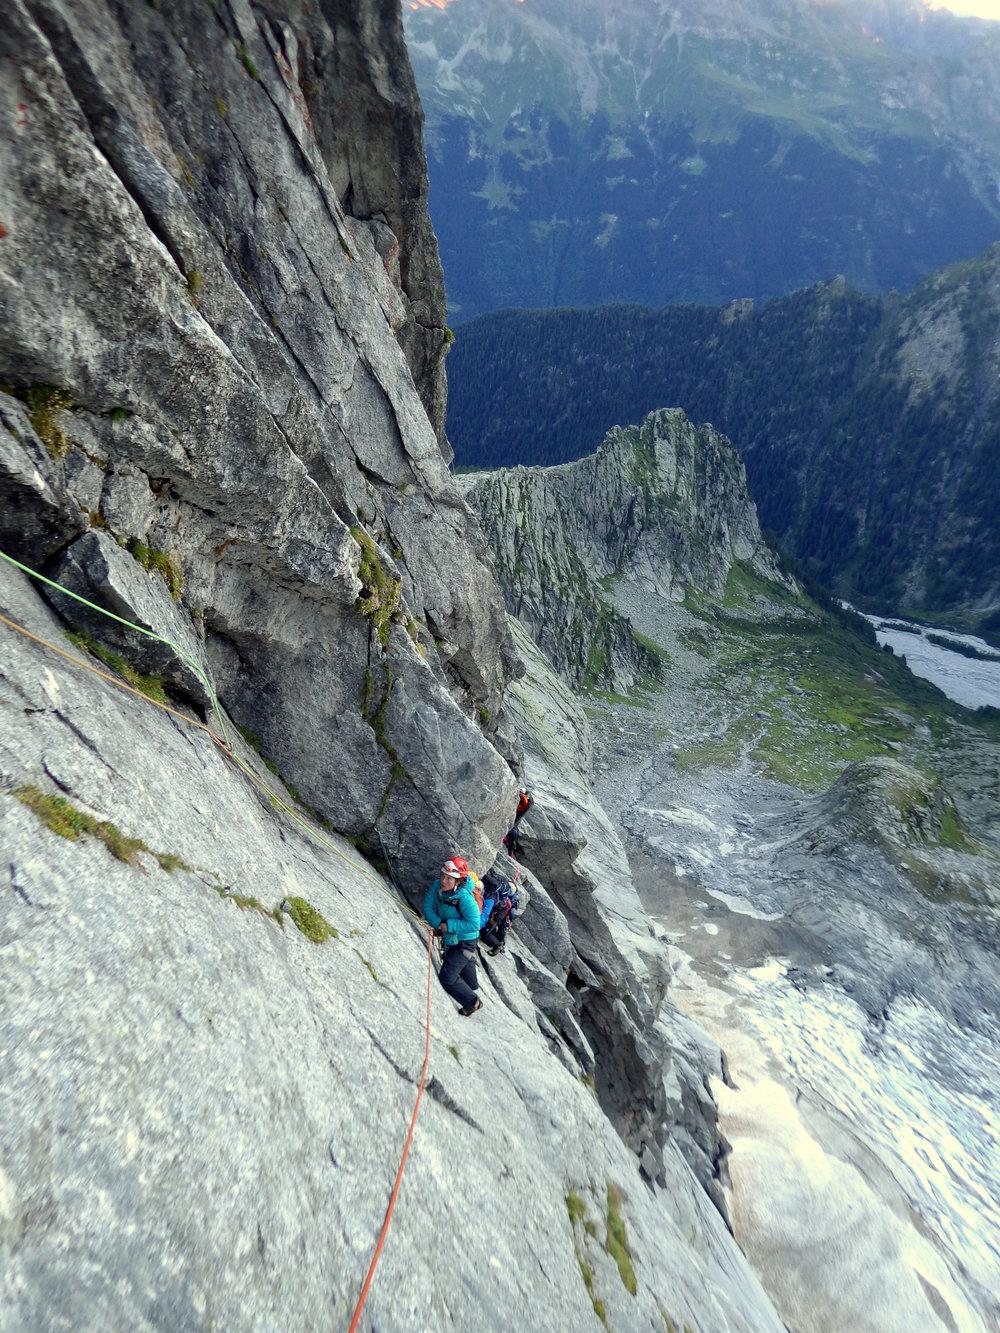 Mandy eyeing up the traverse, Cassin Route, Piz Badile